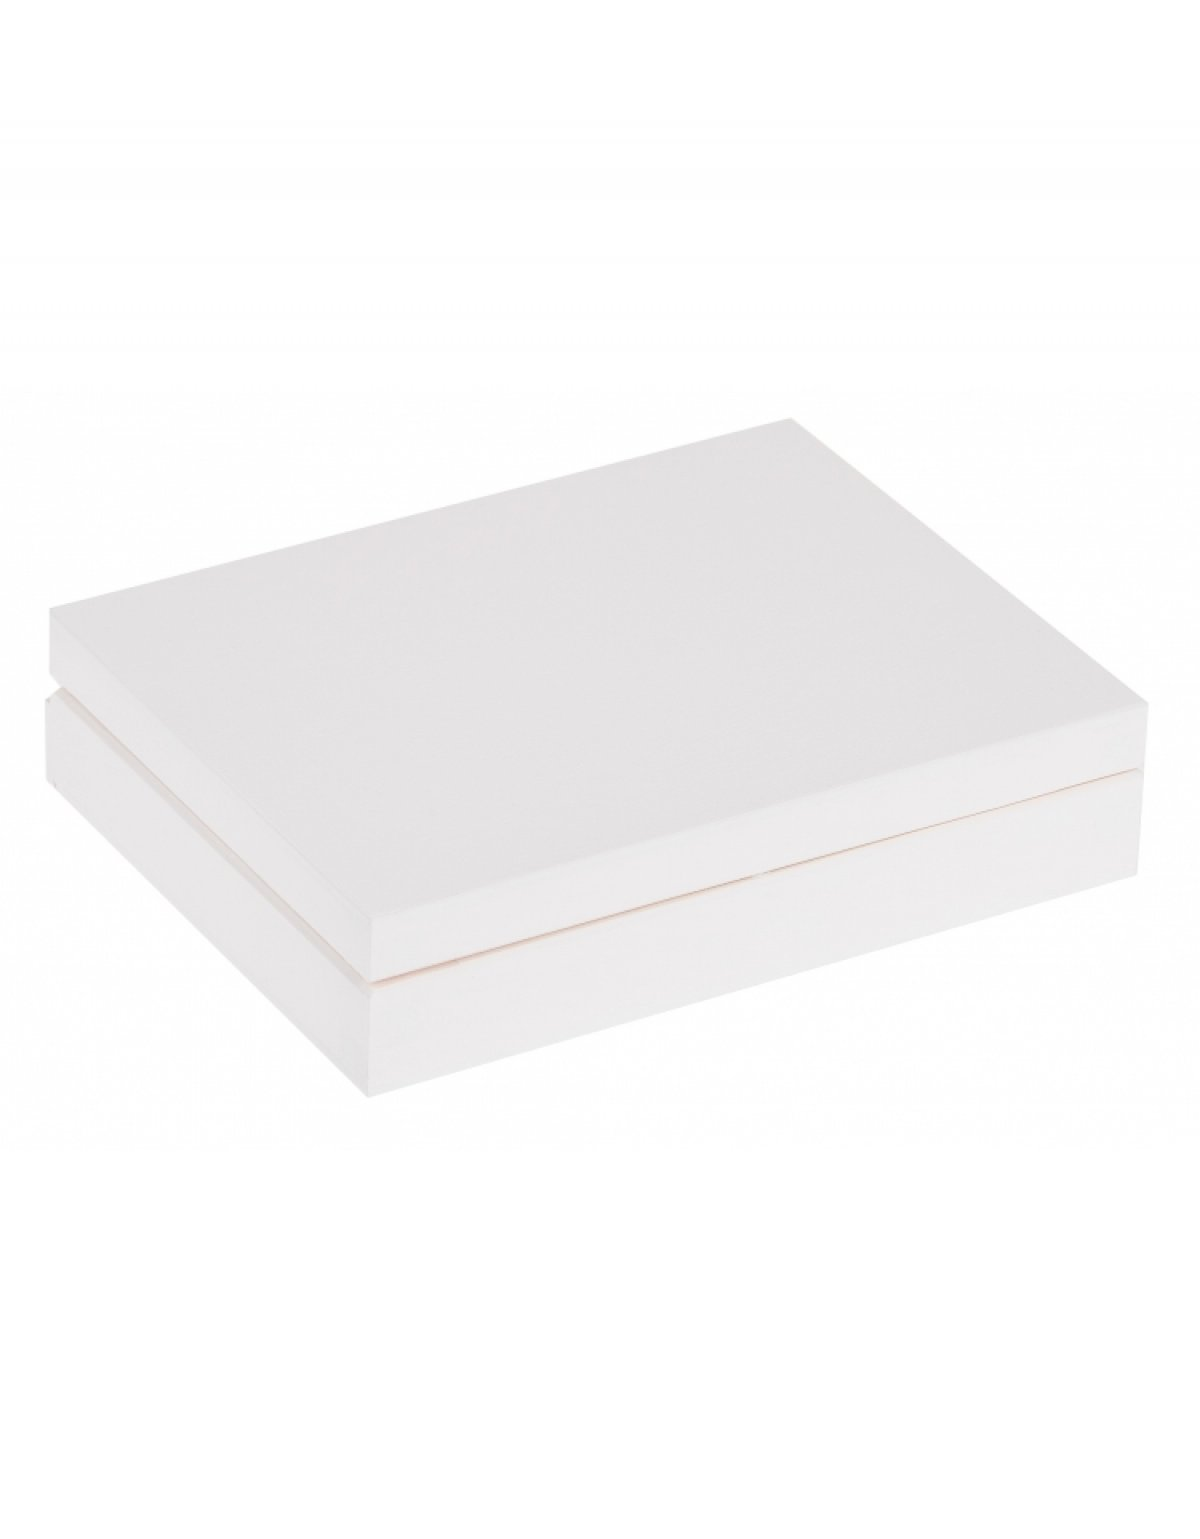 Krabička dřevěná 16x12,5x4 cm na magnet - bílá